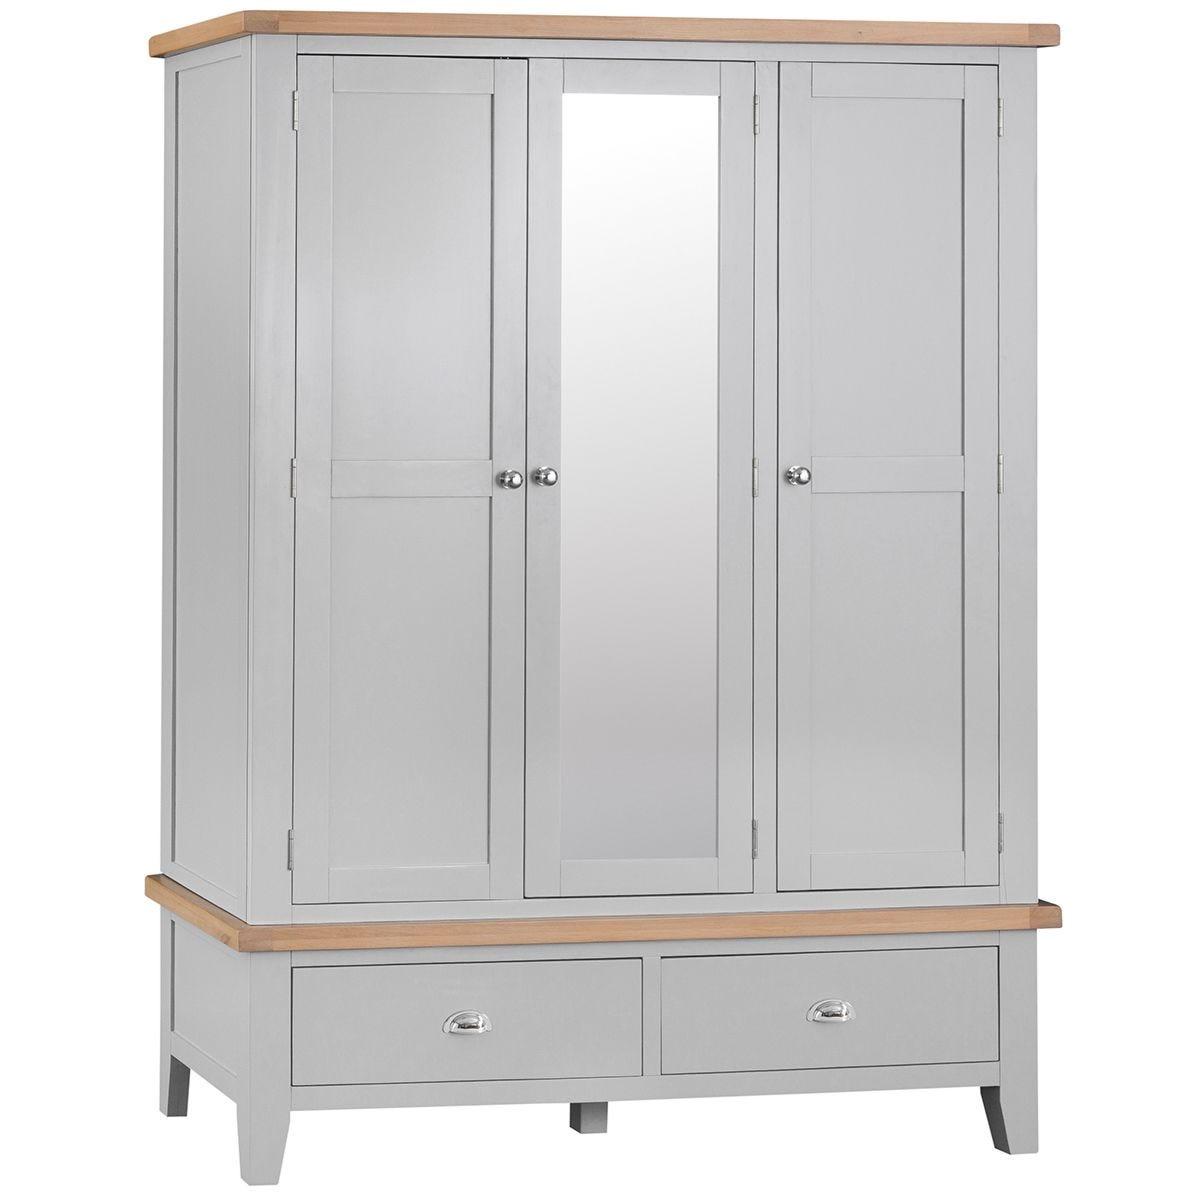 Madera 3 Door Wardrobe - Grey